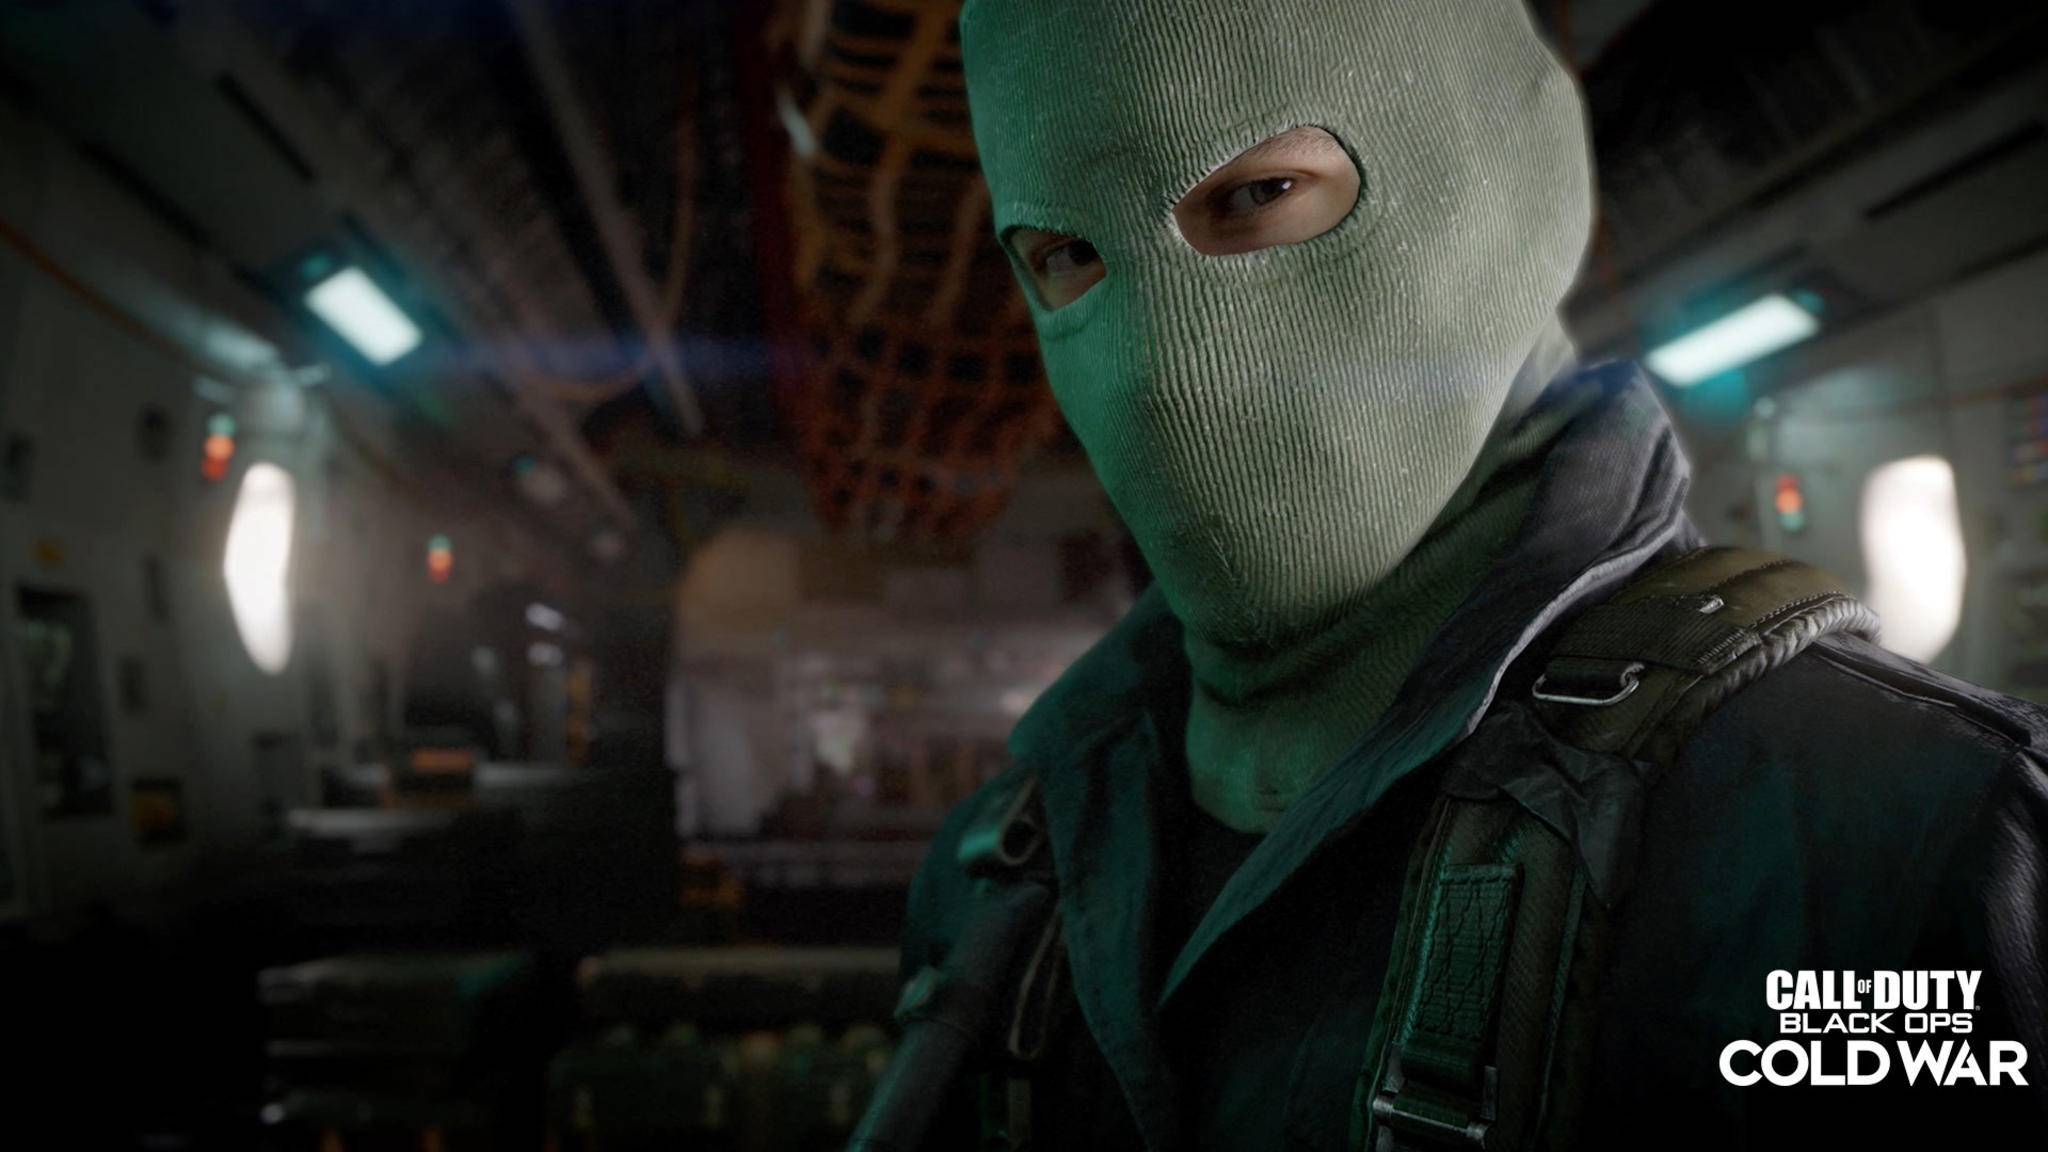 call-of-duty-black-ops-cold-war-maske